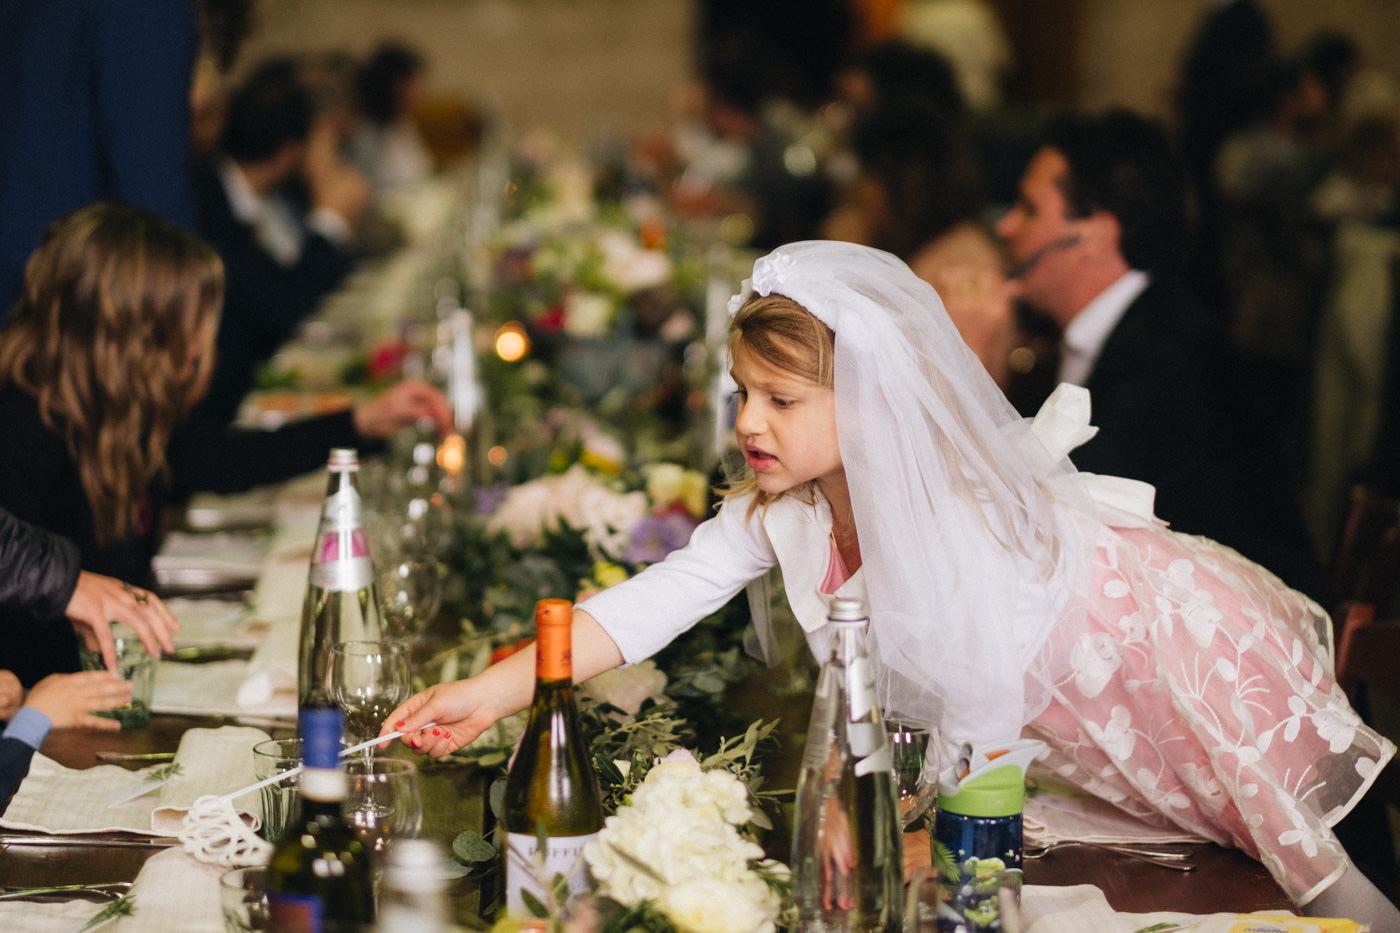 matrimoni_all_italiana_fotografo_matrimonio_toscana-67.jpg